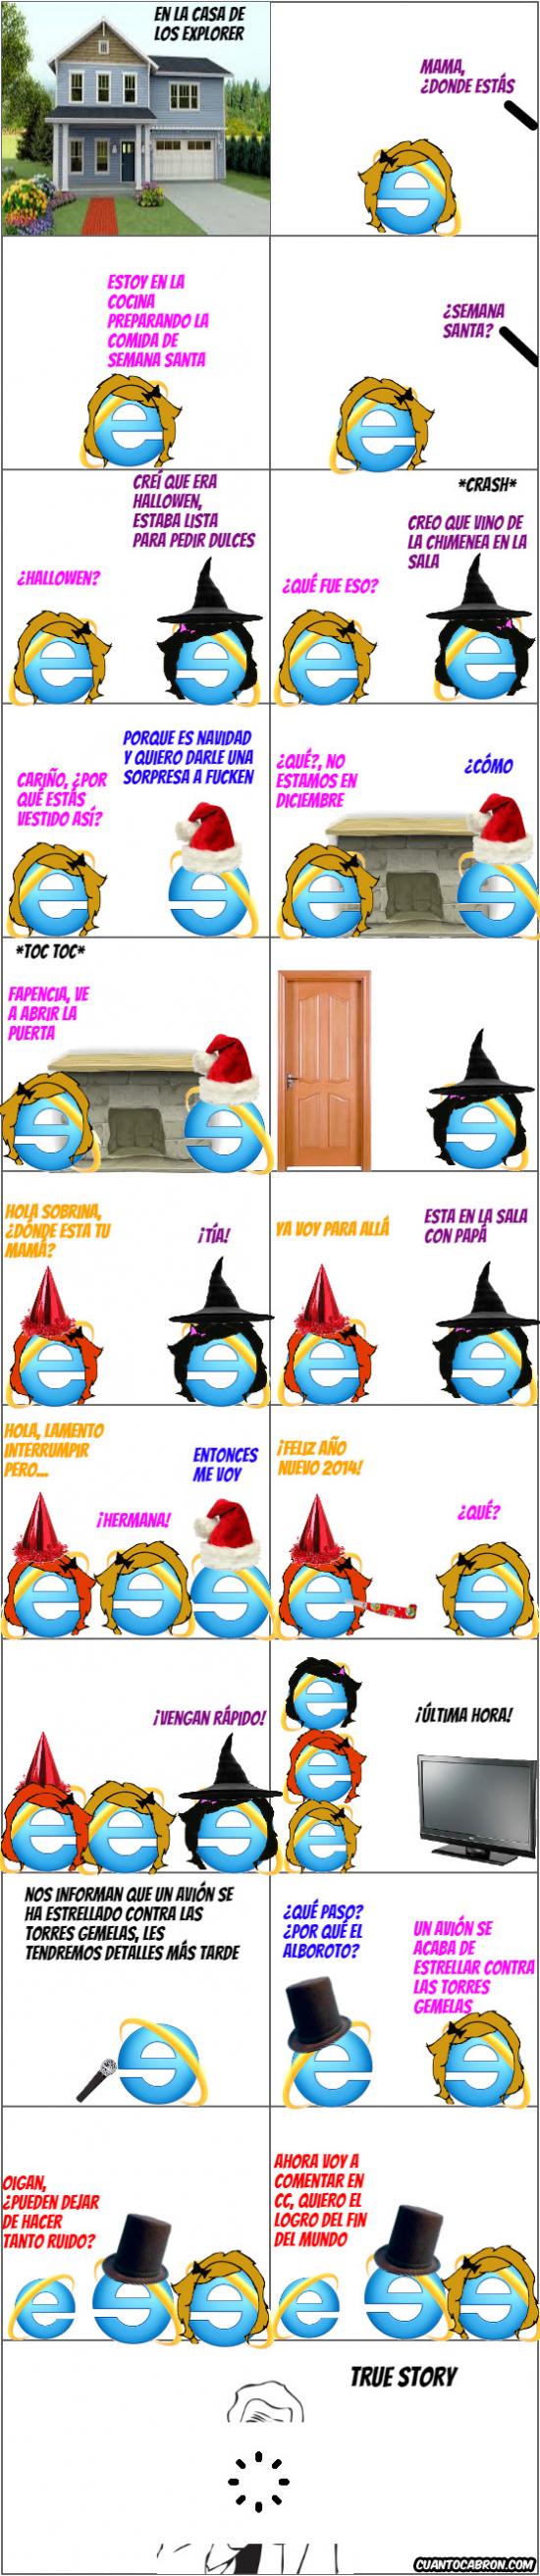 True_story - En el universo de Internet Explorer...